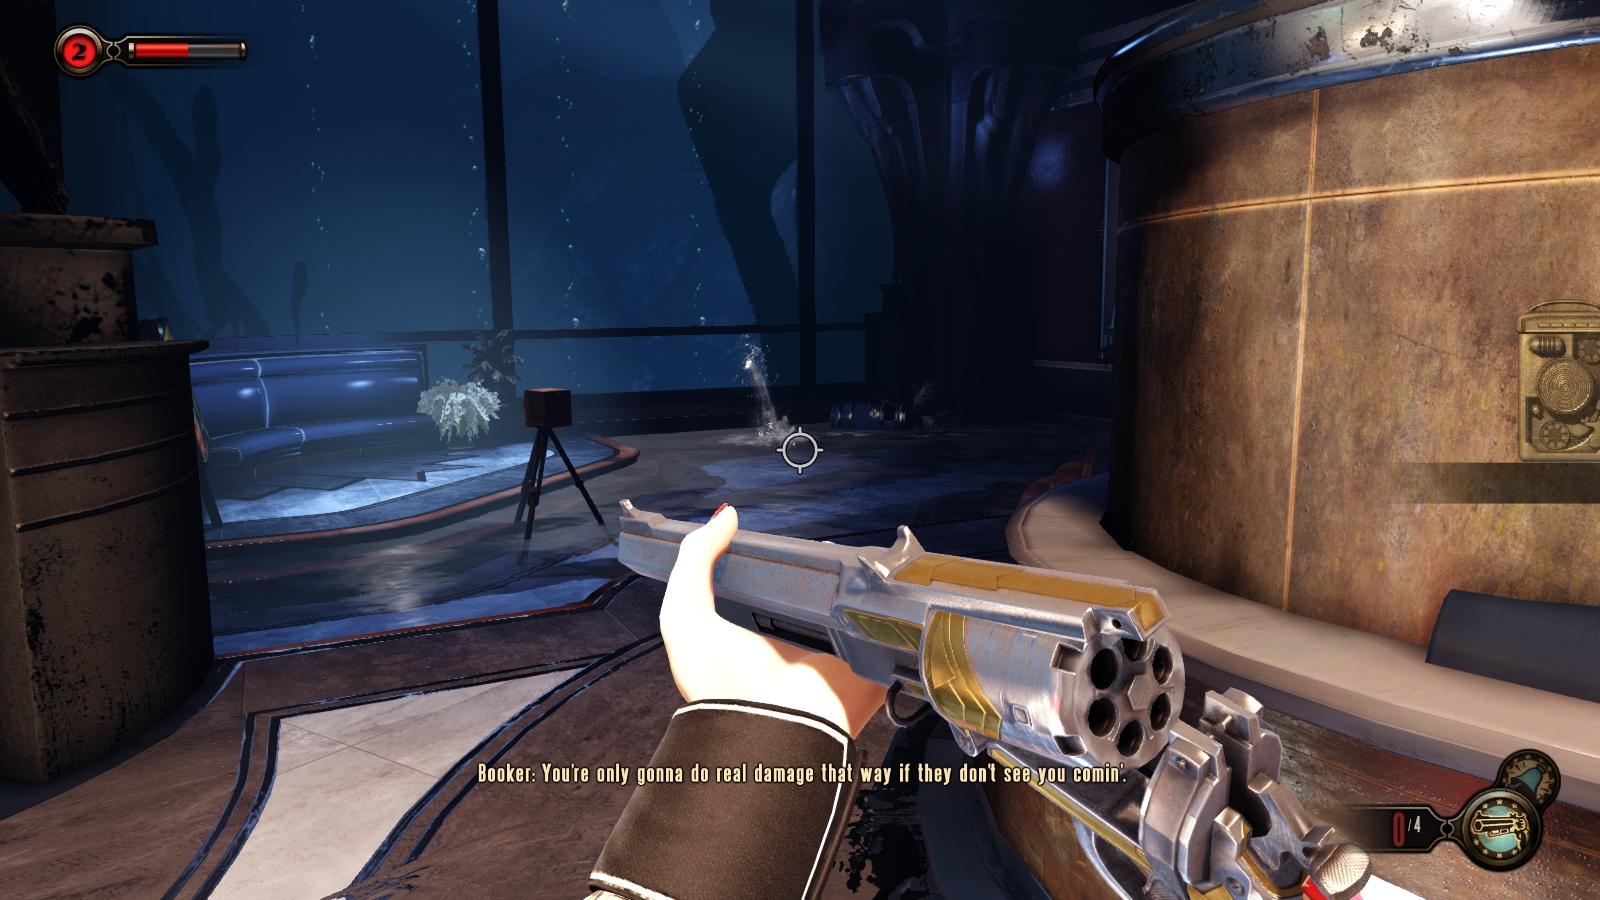 BioShock Infinite: Burial at Sea Episode Two